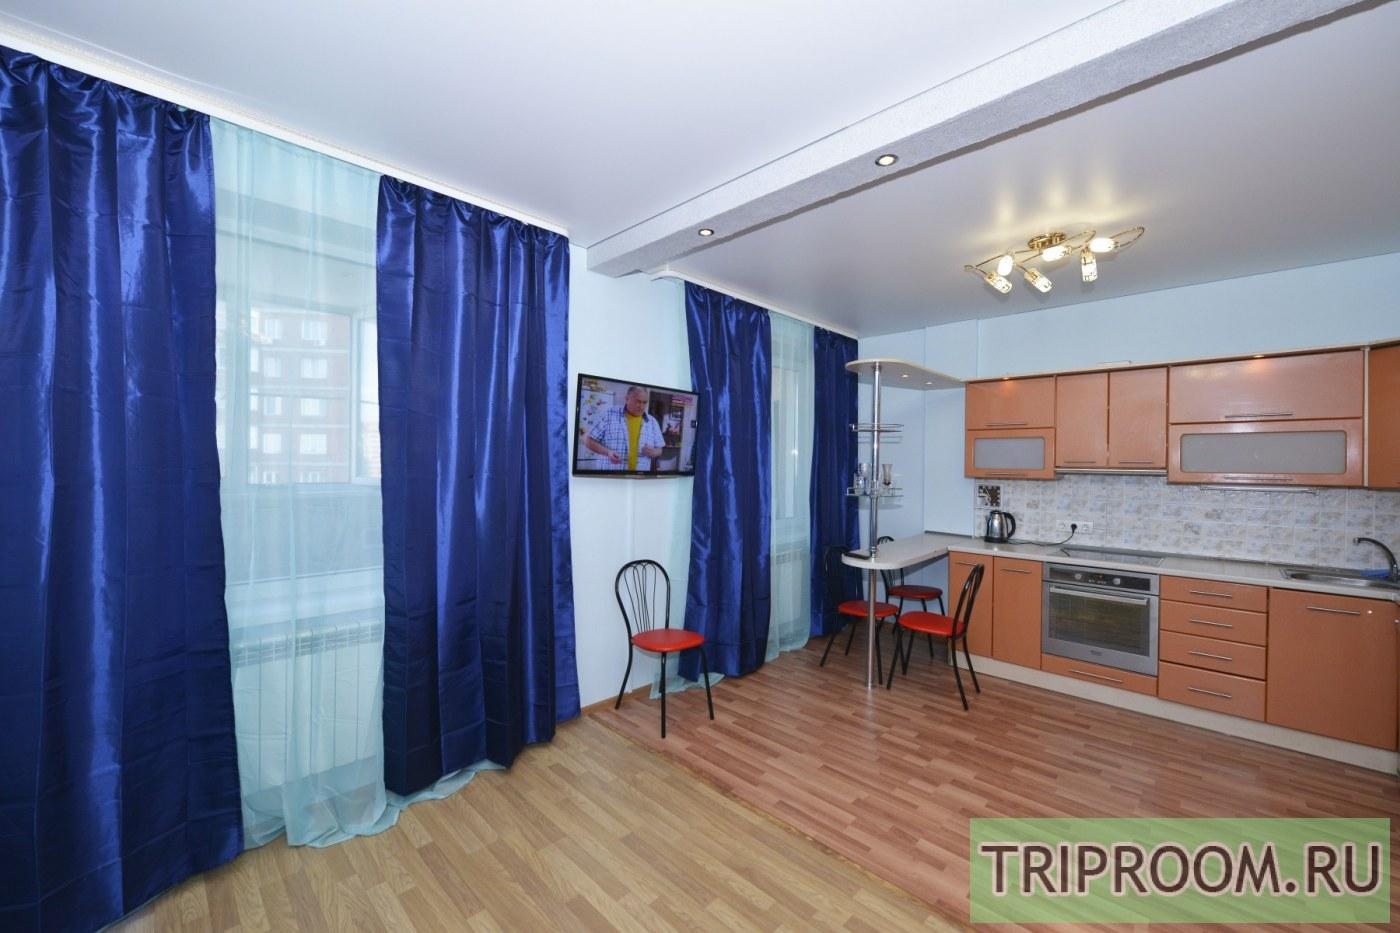 1-комнатная квартира посуточно (вариант № 40607), ул. Галущака улица, фото № 9